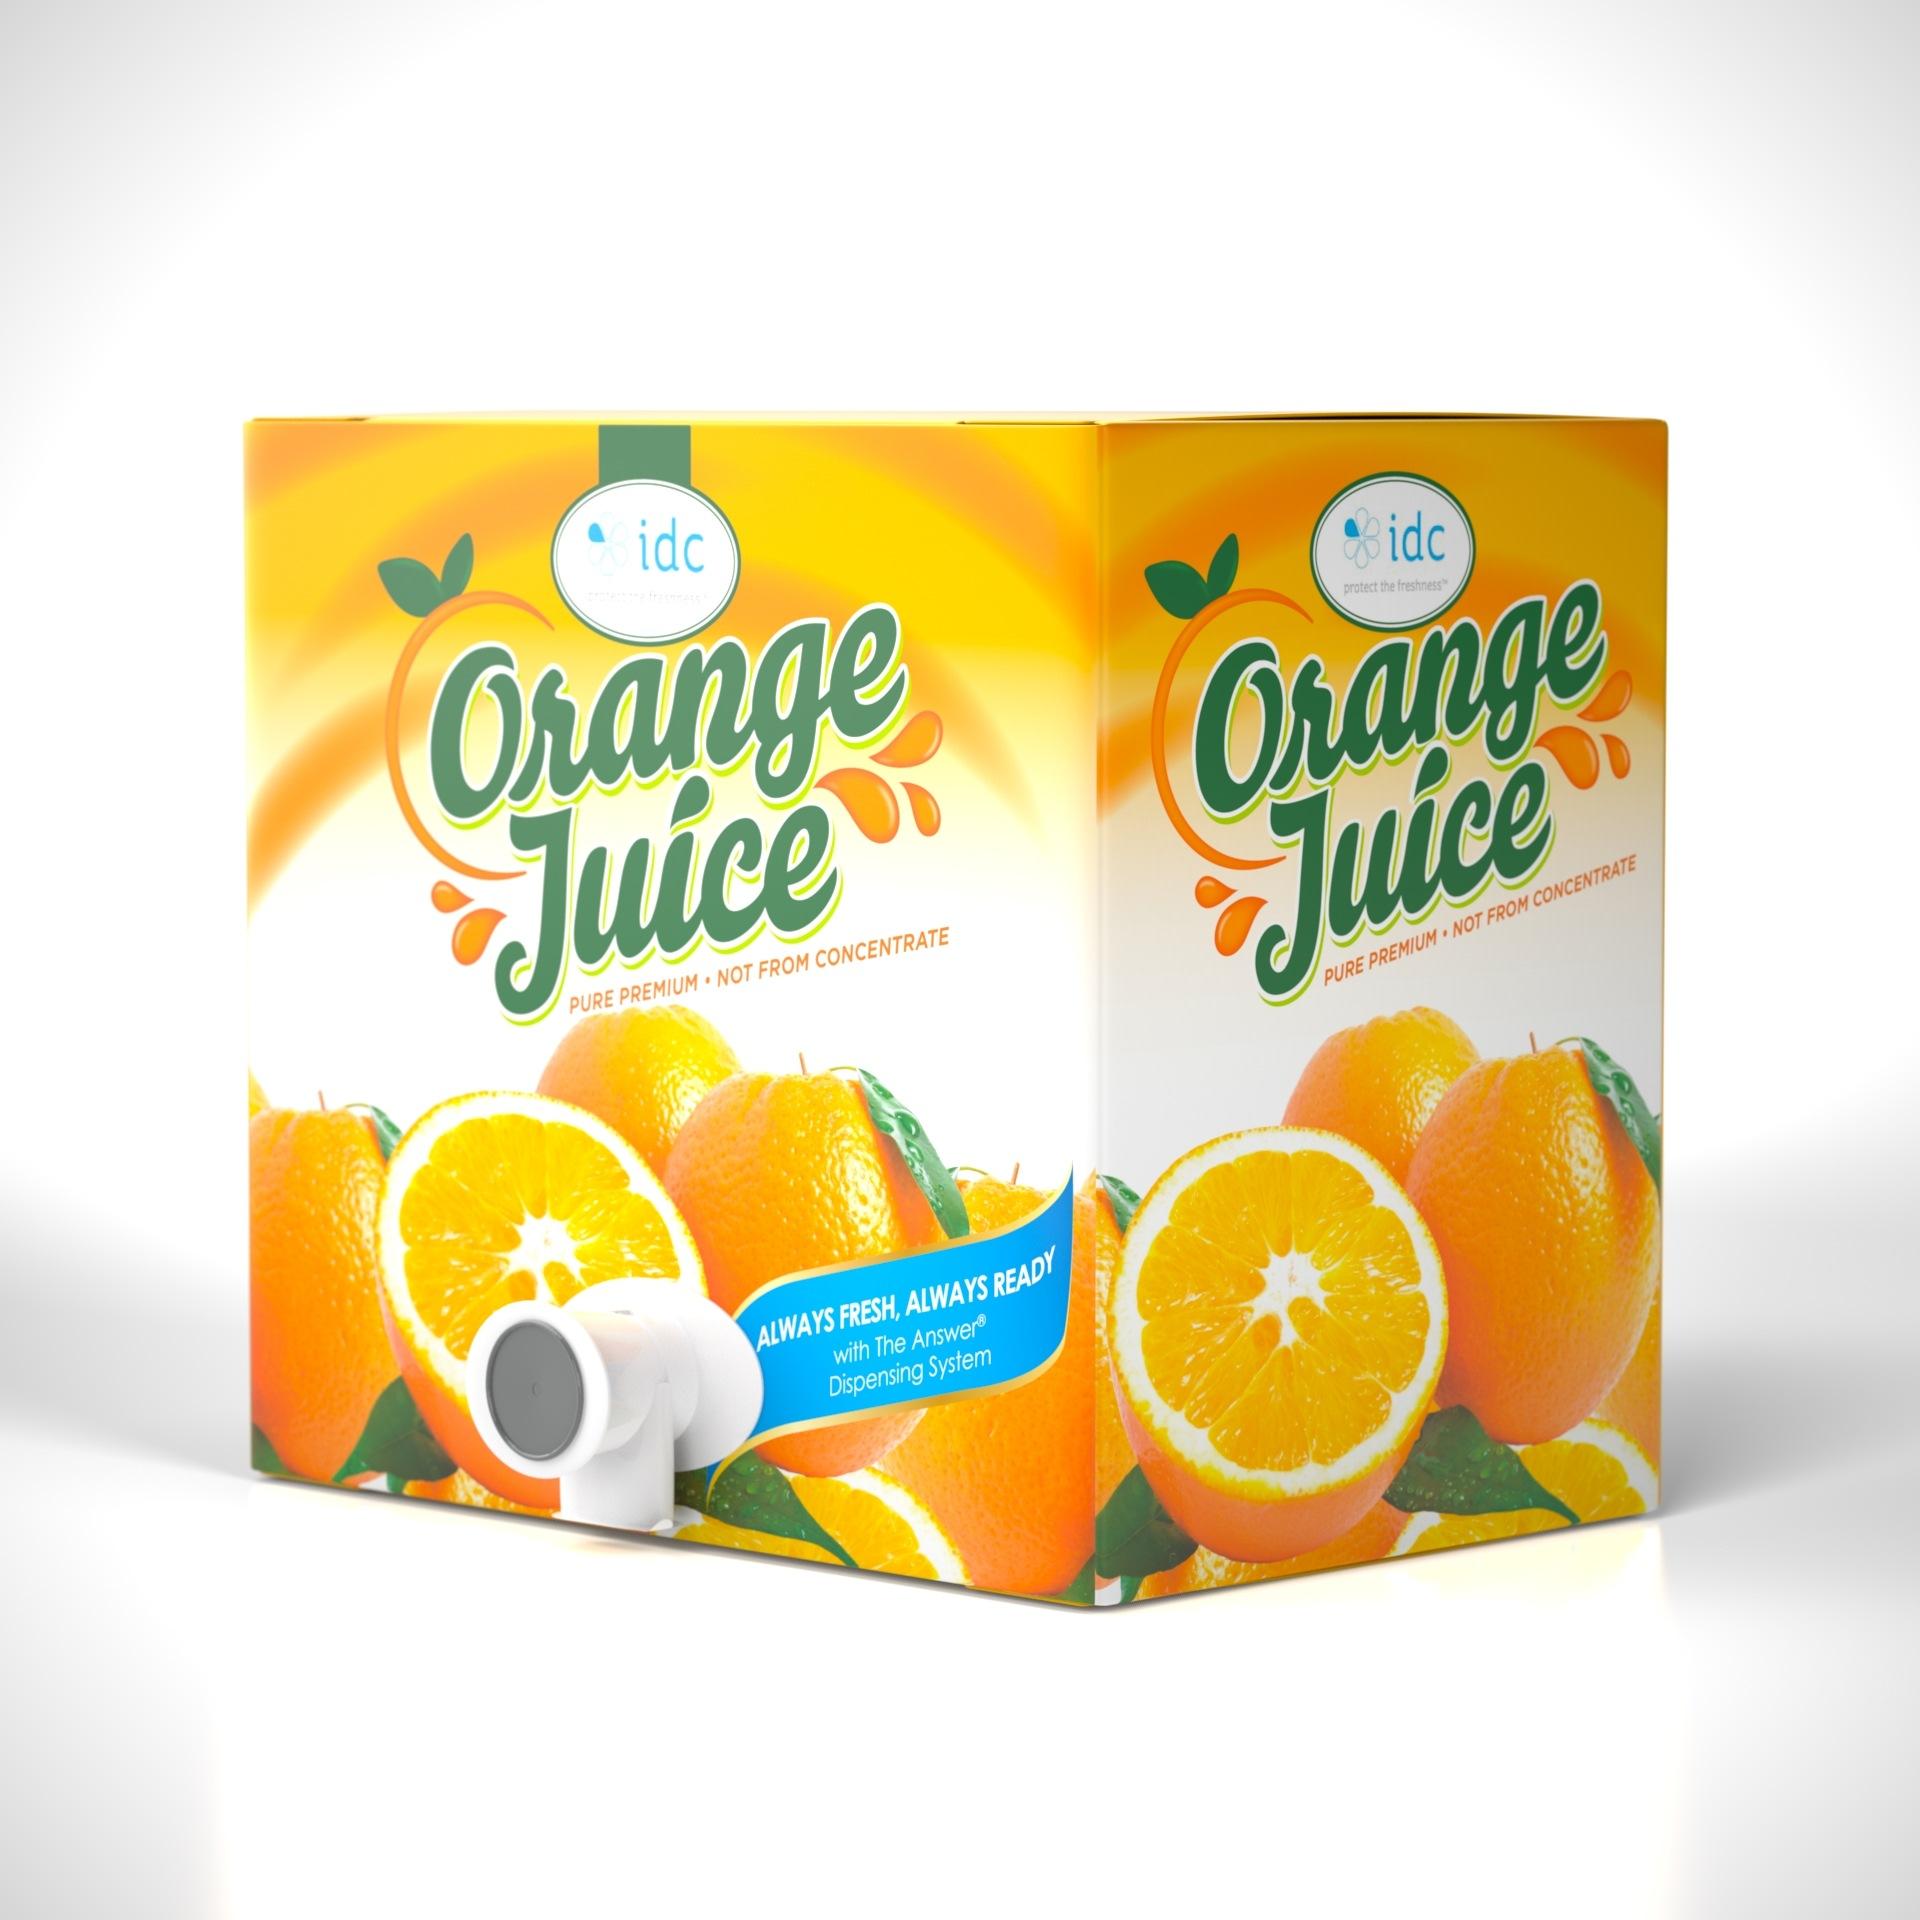 Orange juice miller creative for Wine and orange juice name